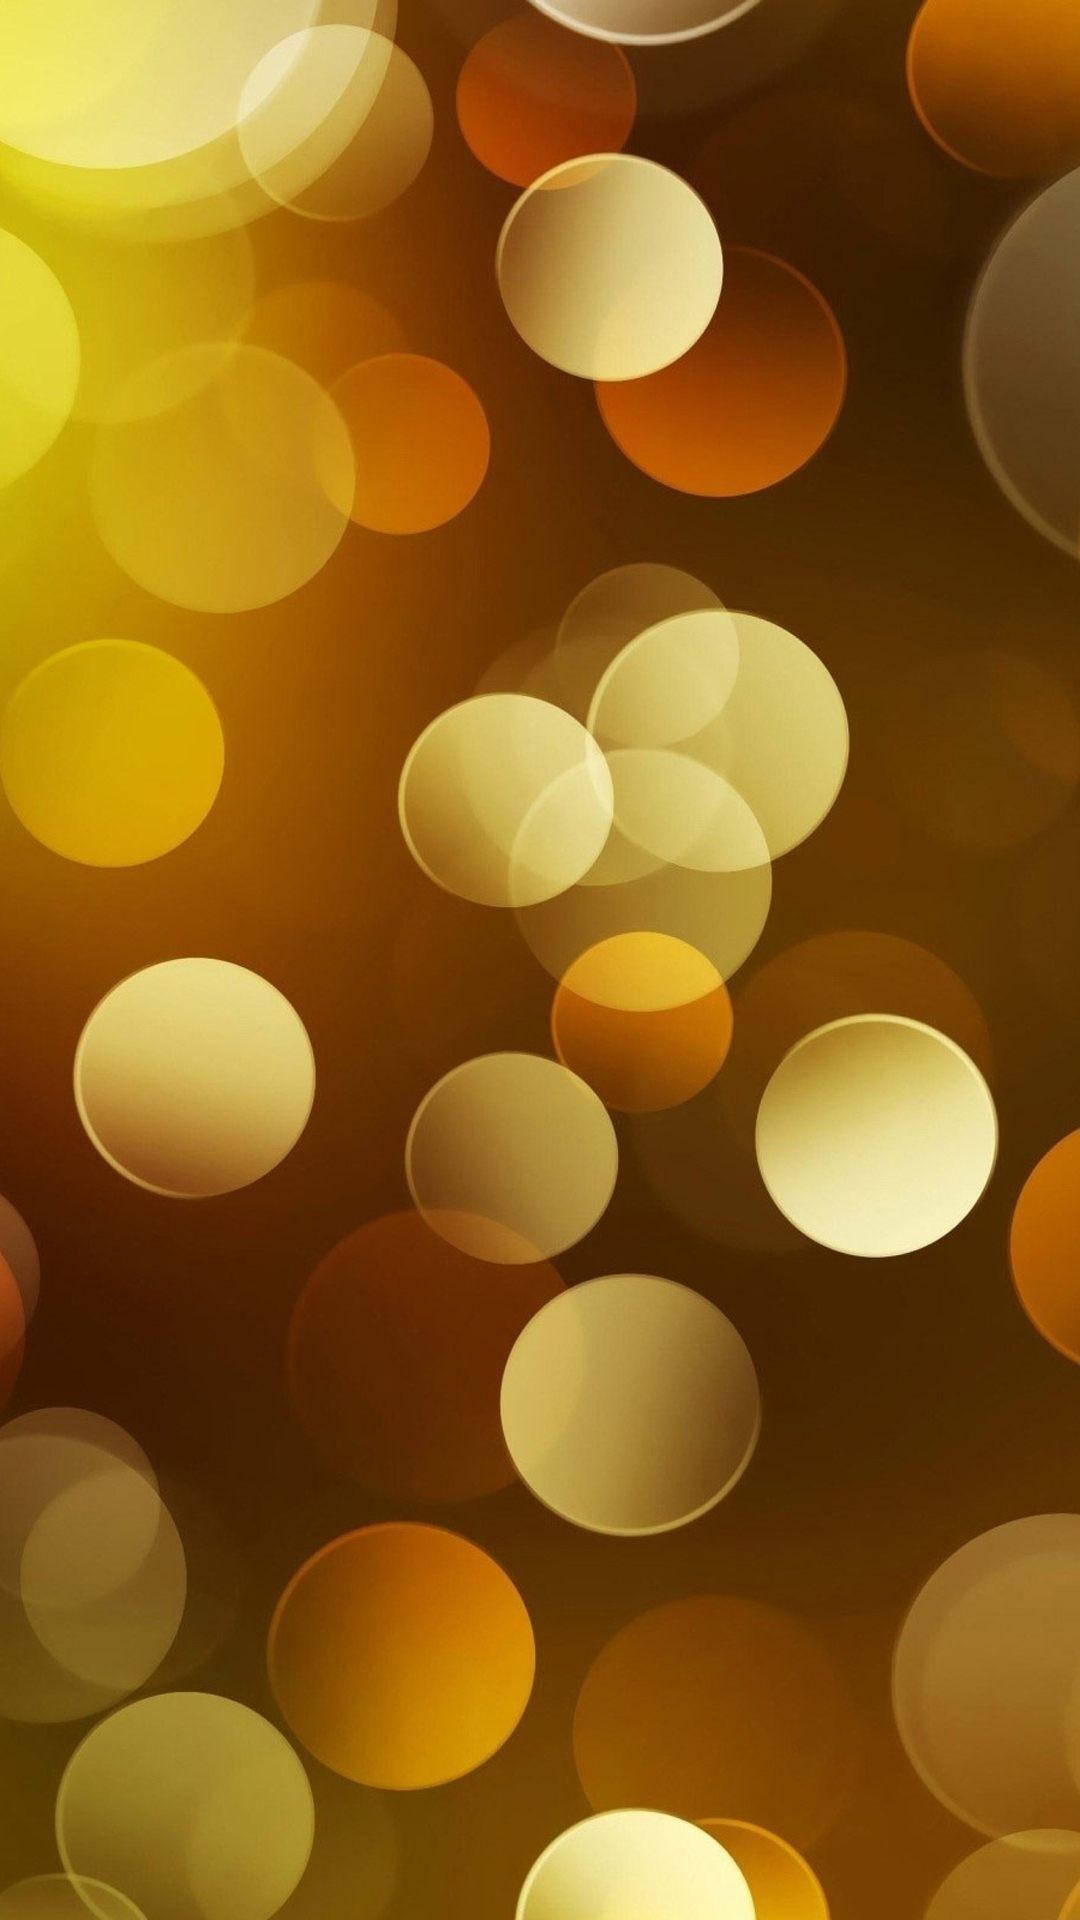 … f84801_34b4c494ecb0212719fa9e456929c693_raw Gold Iphone Wallpaper  iphone 6 plus wallpaper circles 01_e85a705f7adf79e68b65a2f300e17c8b_raw …